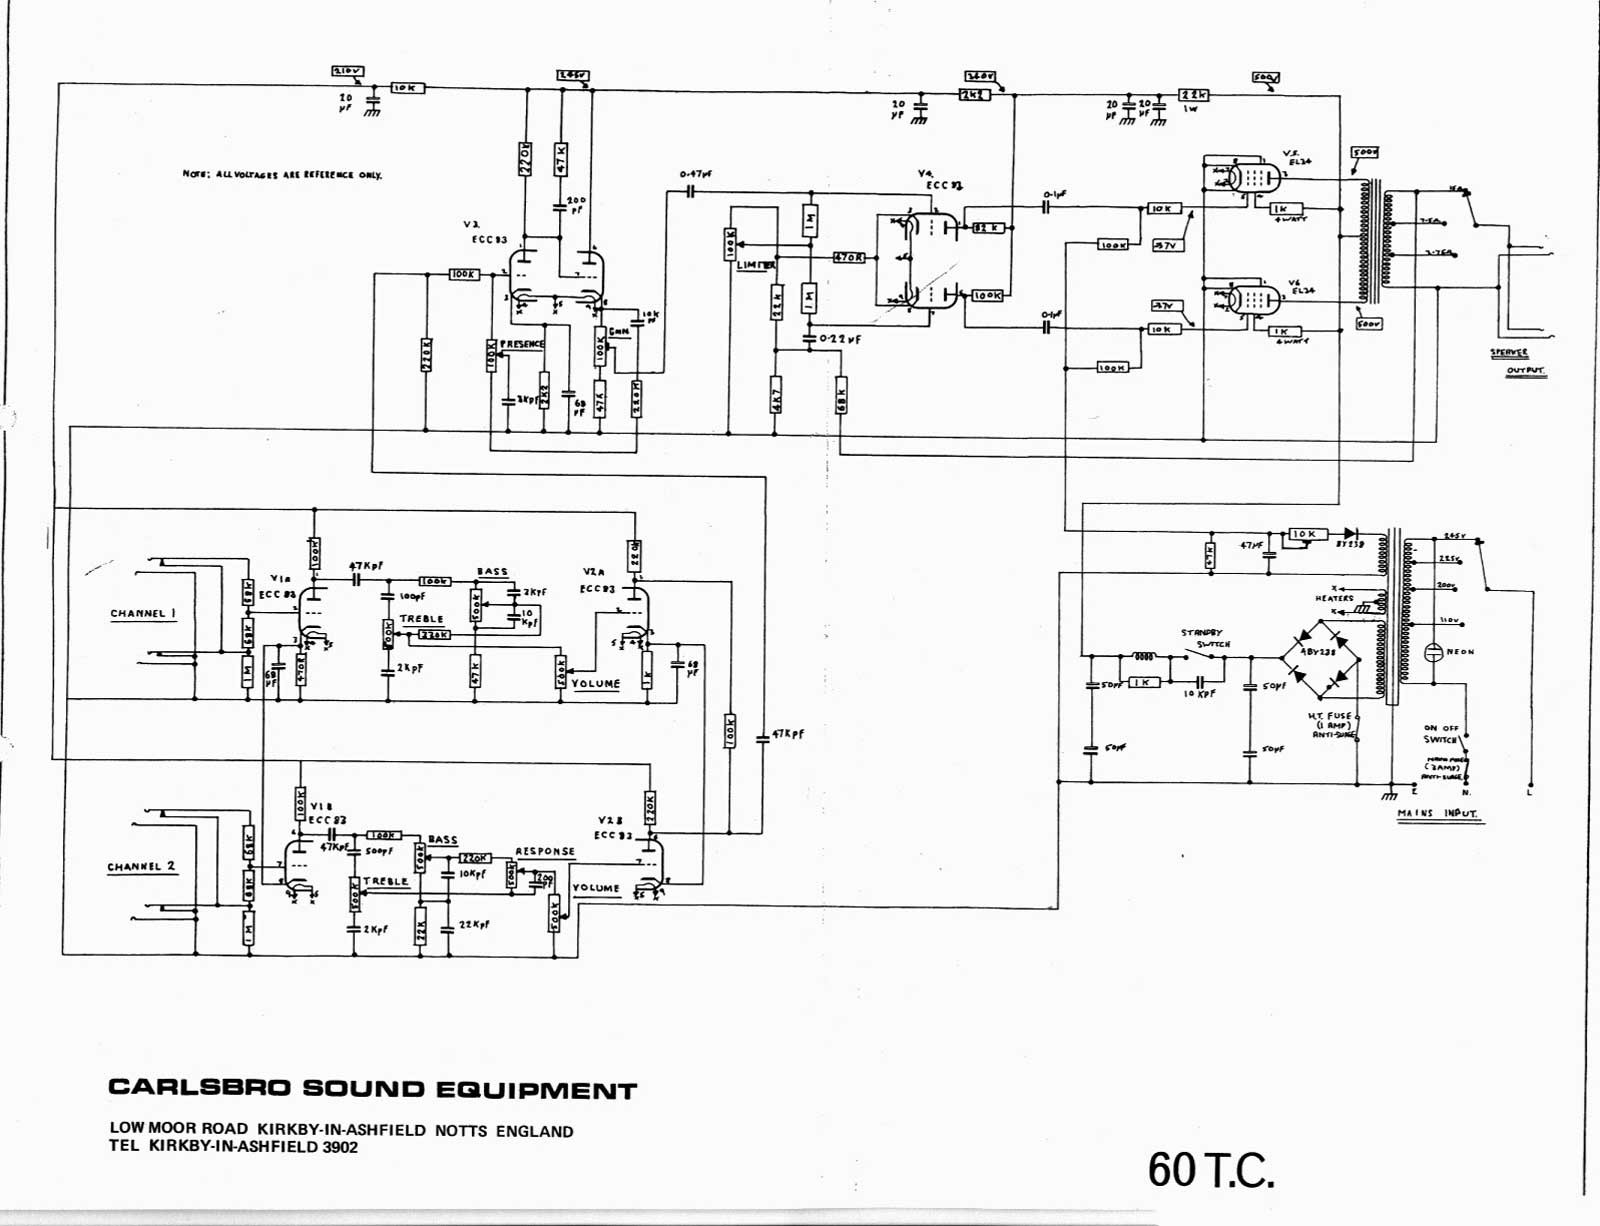 Peavey Firenza P90 Wiring Diagram - 15.7.stefvandenheuvel.nl • on p90 pickup adjustment, p90 pickup installation, p90 wiring 3 pickups, les paul wiring diagram, gibson p 90 wiring diagram, p90 pickup cavity dimensions, p 90 wirig diagram, p90 pickup capacitor,